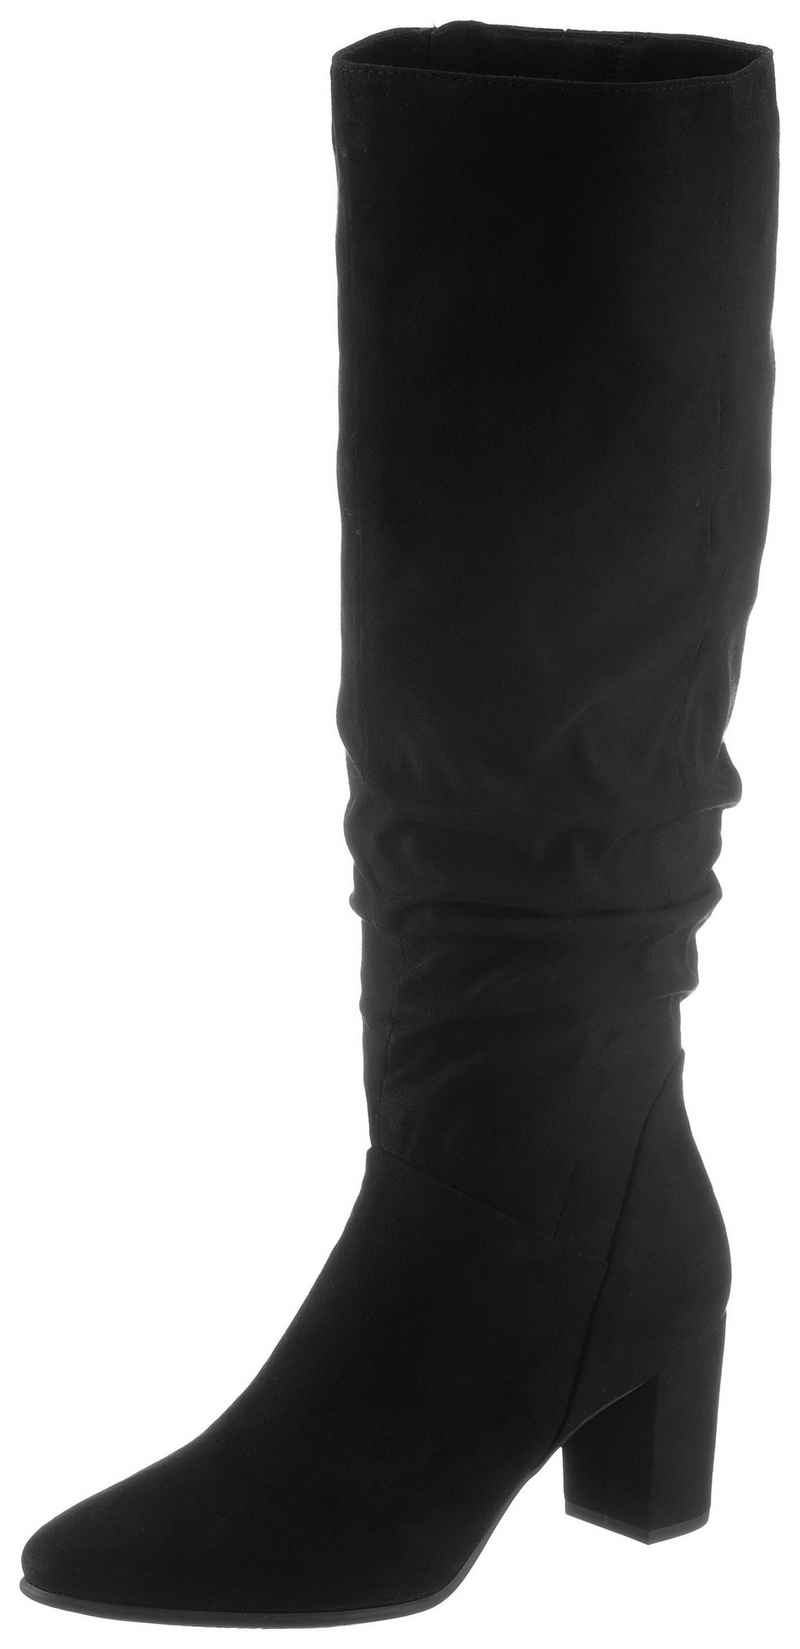 MARCO TOZZI Stiefel mit gerafftem Schaft